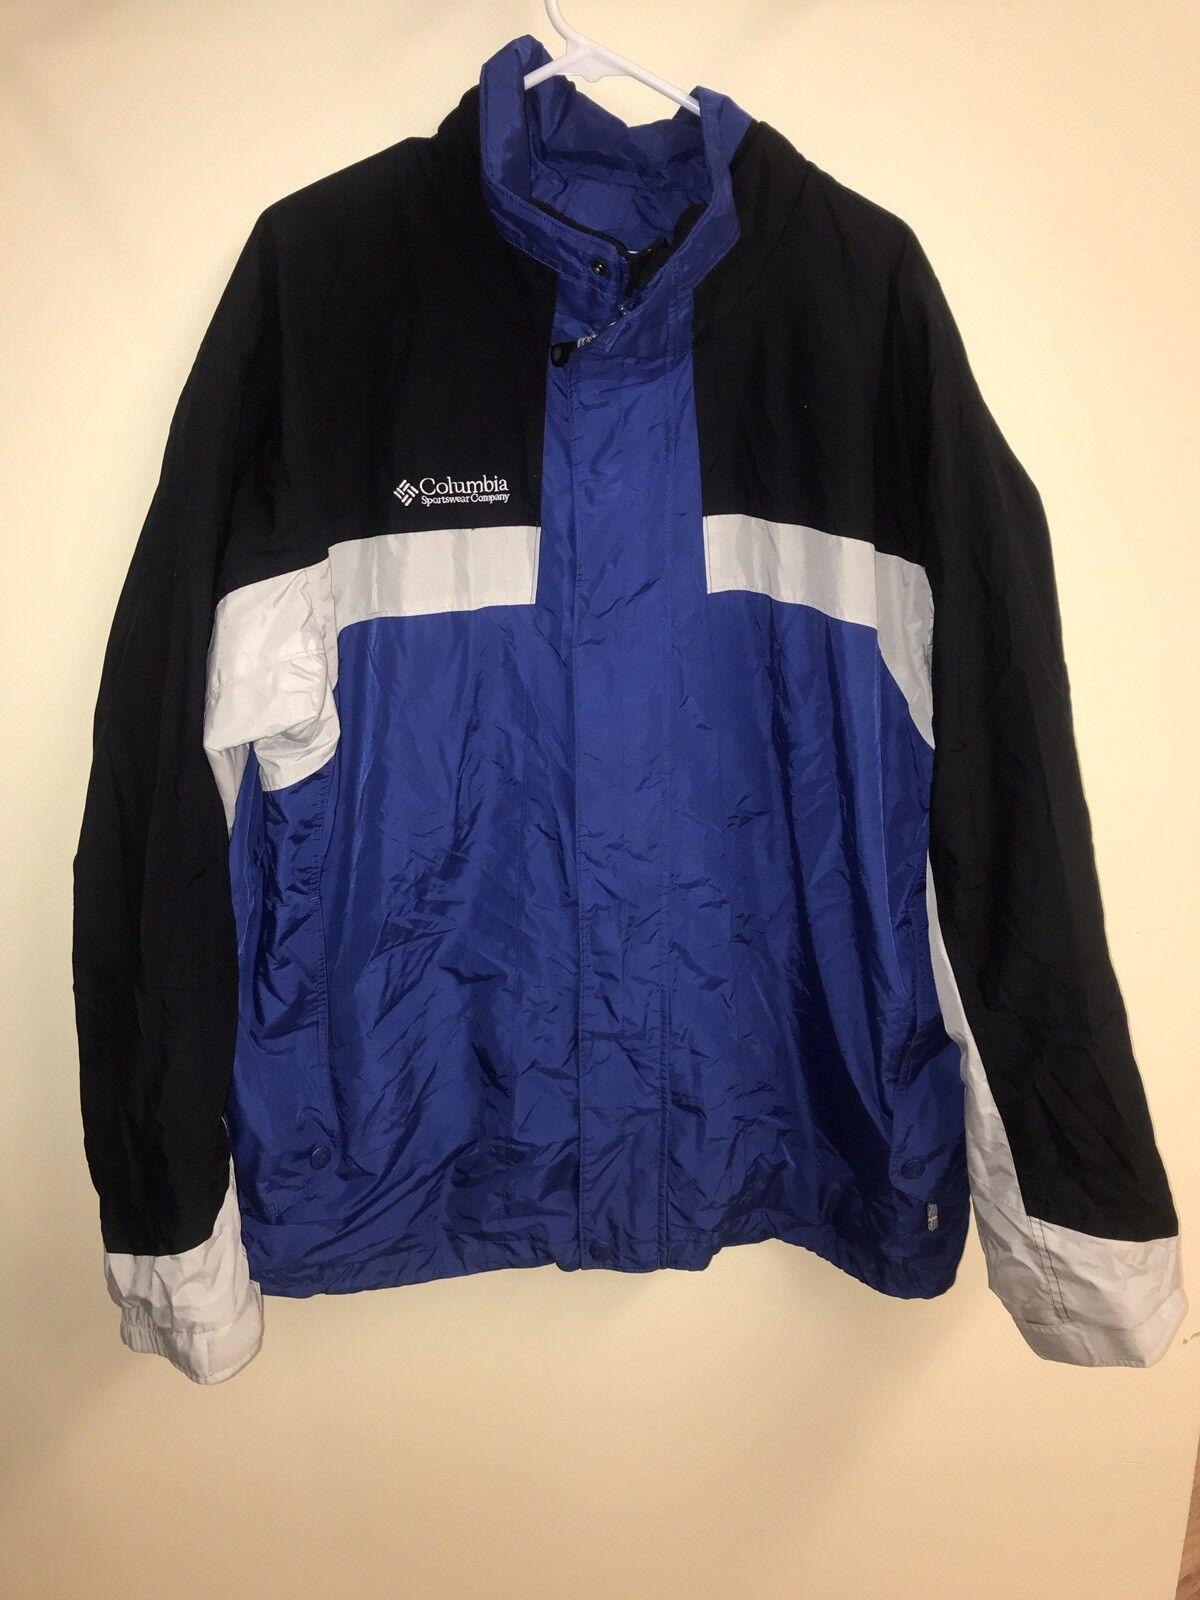 Mallimoda Boys Girls 3-in-1 Jacket with Fleece Liner Winter Outdoor Coat Outwear